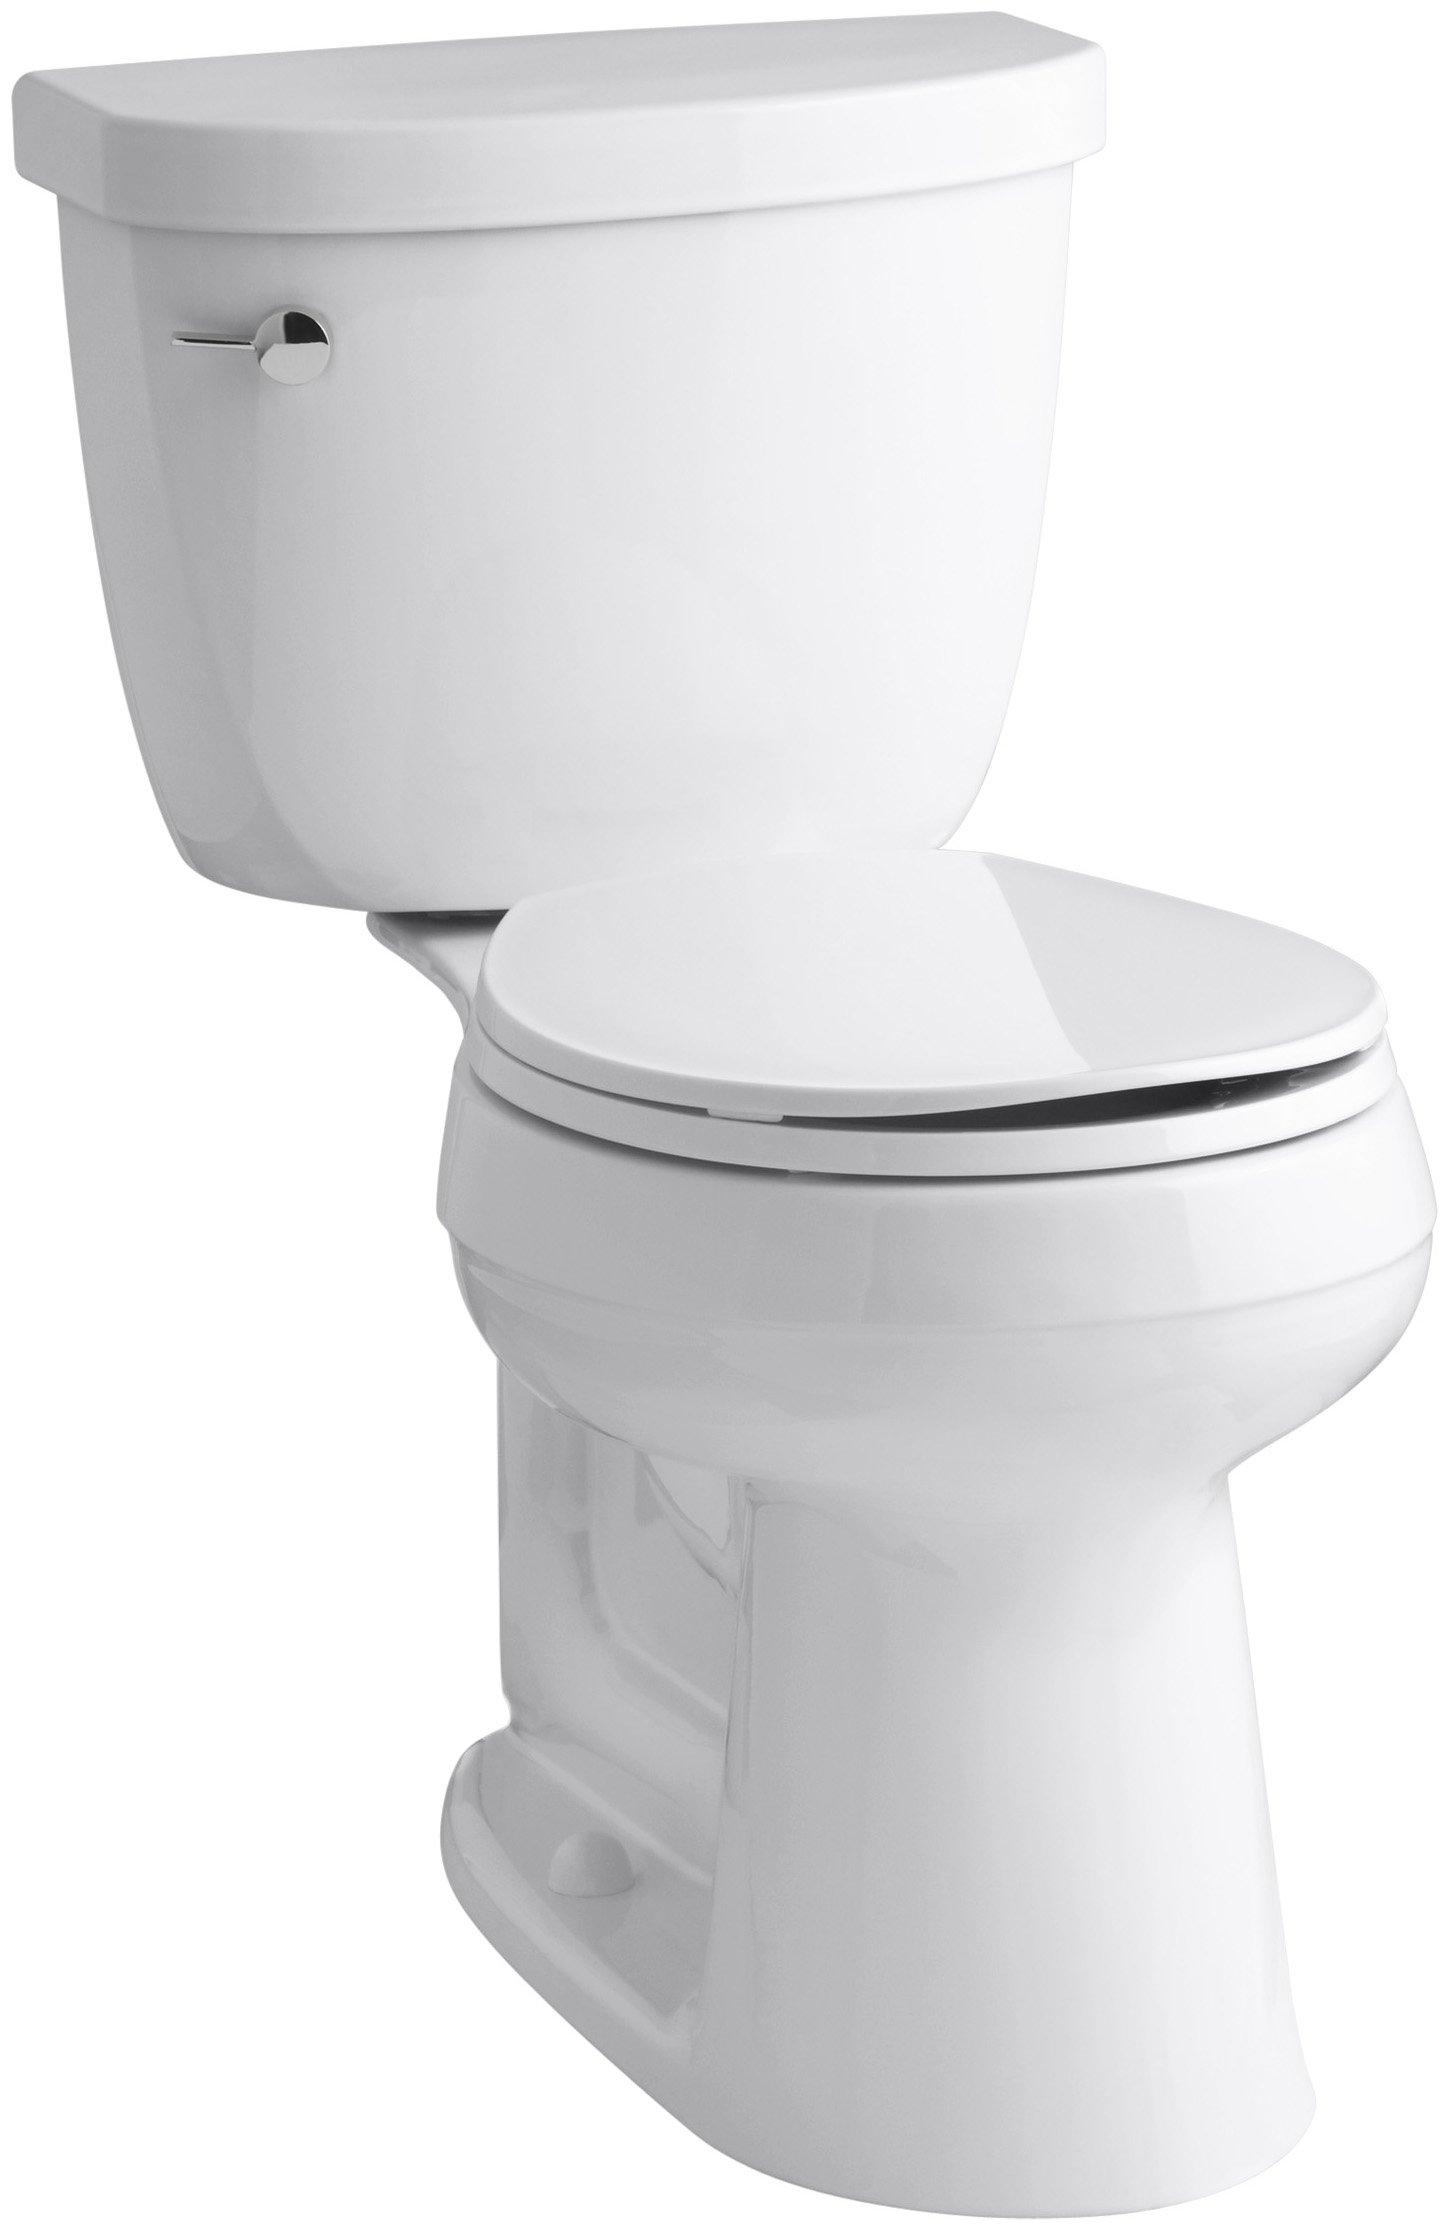 KOHLER K-3887-0 Cimarron Comfort Height Two-Piece Round-Front 1.28 GPF Toilet with AquaPiston Flush Technology and Left-Hand Trip Lever, White by Kohler